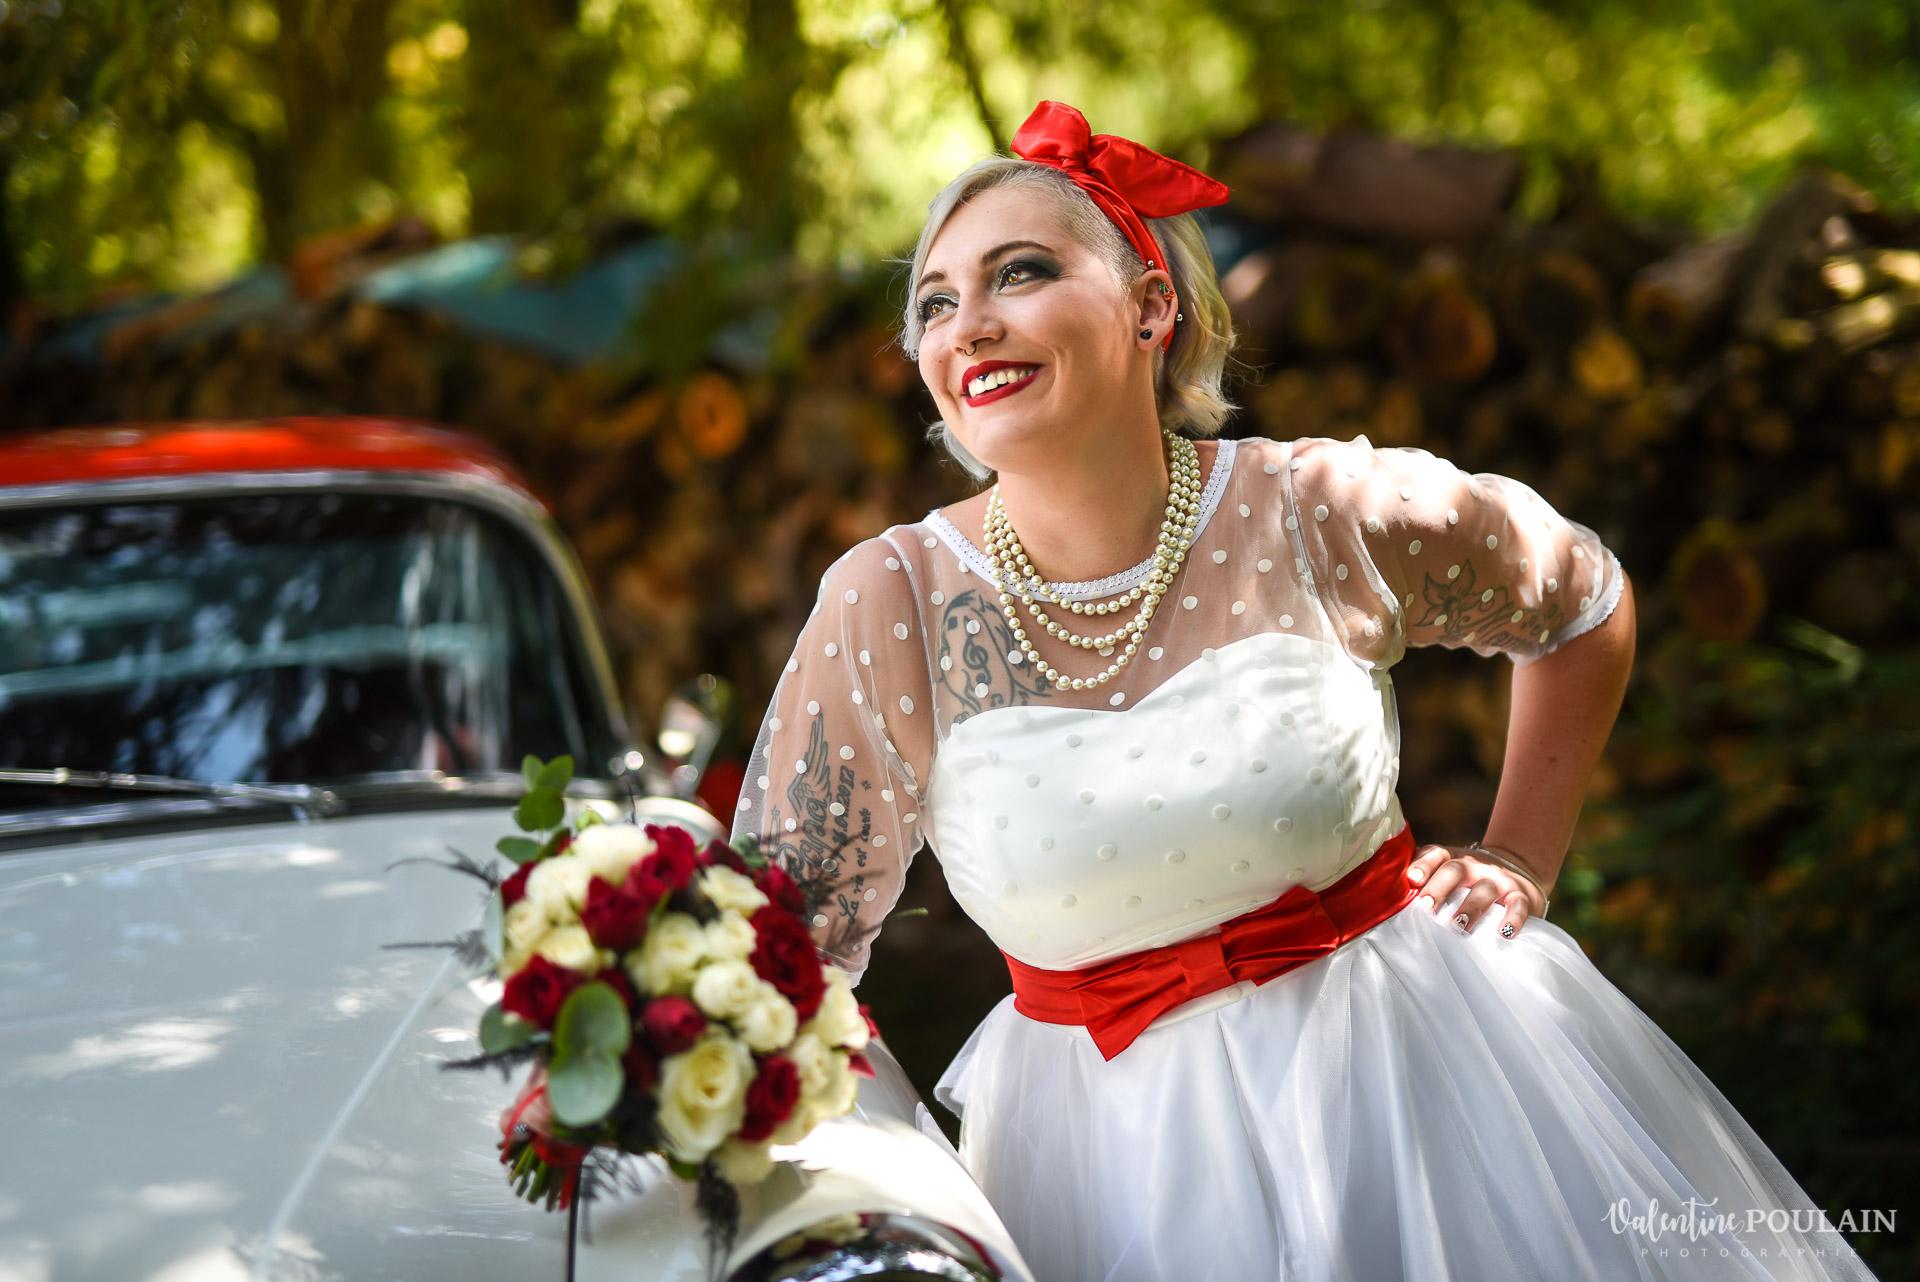 Mariage vintage rockabilly - Valentine Poulain - mariée